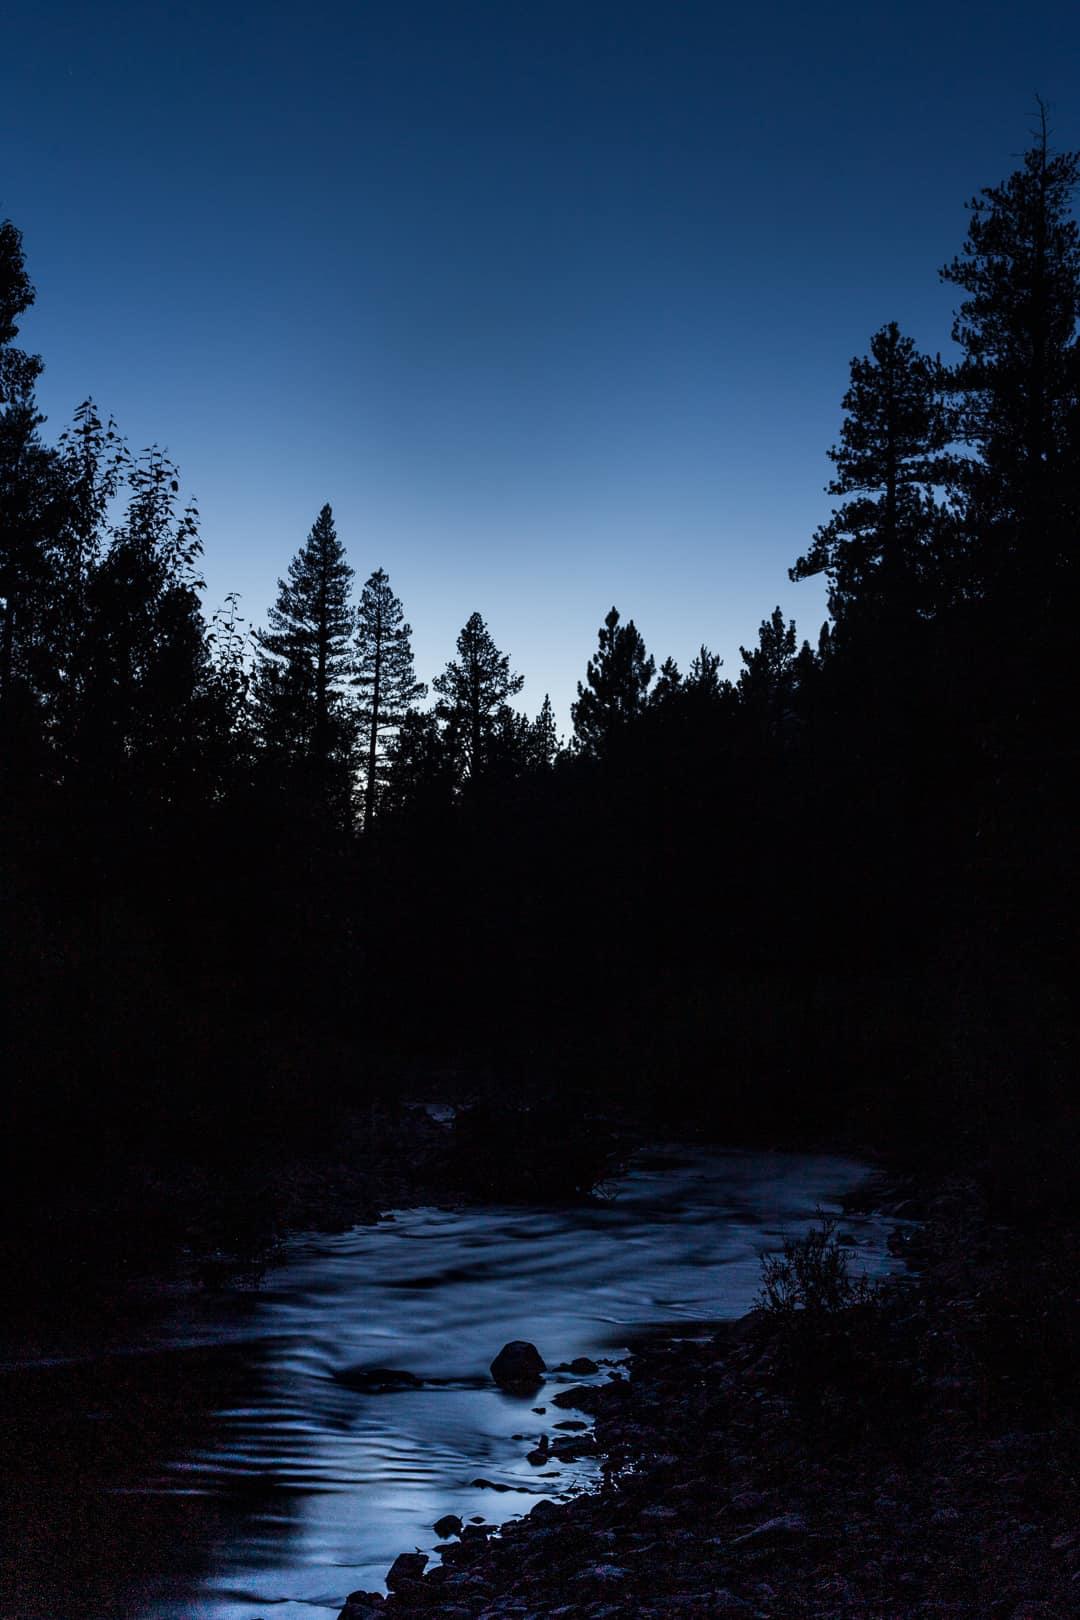 Kennedy Creek, Emigrant Wilderness, August 2018